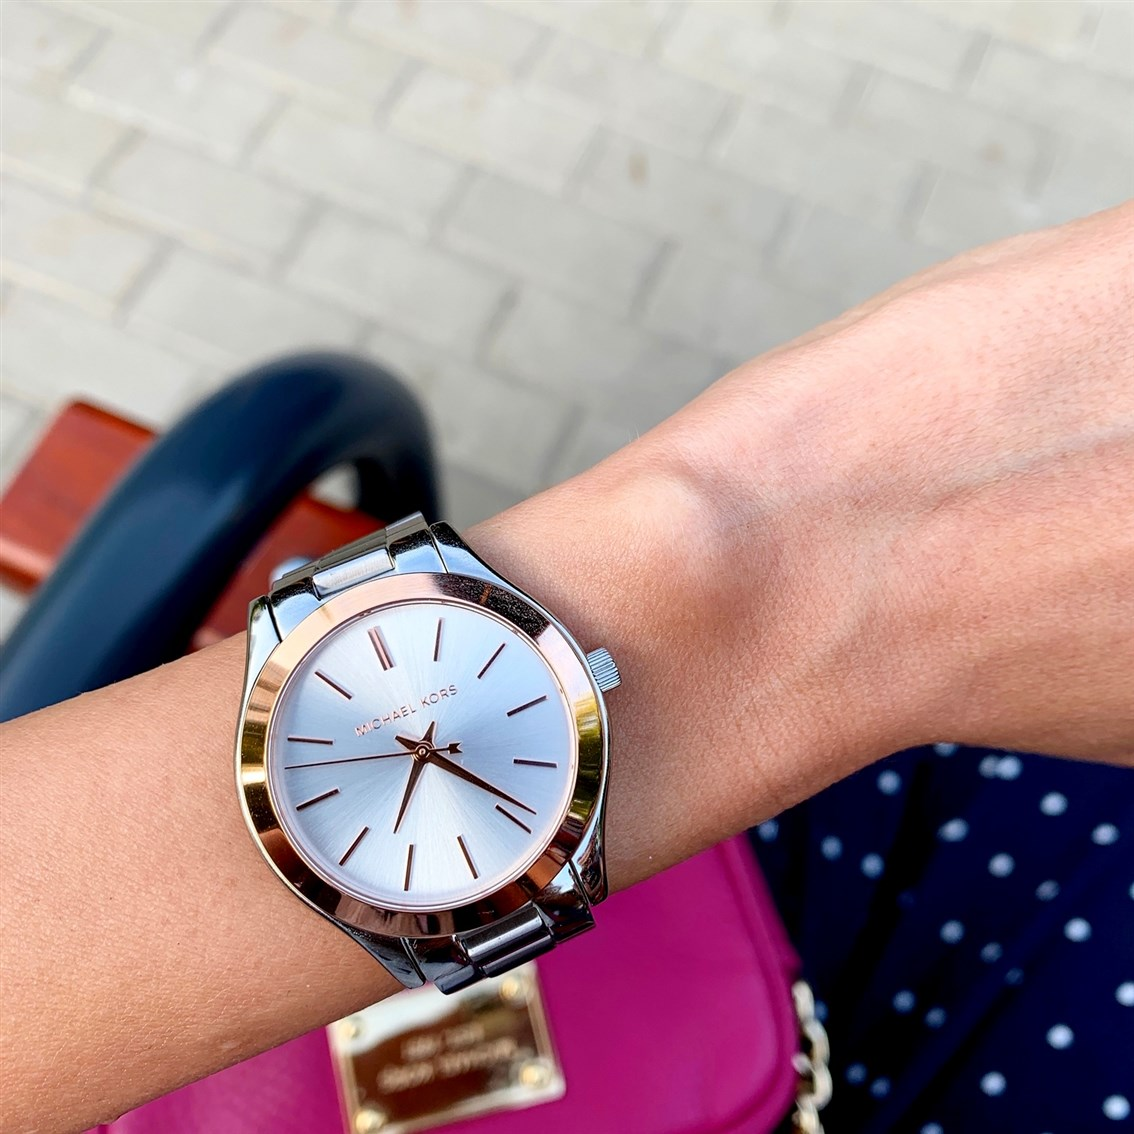 Michael Kors zegarek MK3514 MINI SLIM RUNWAY na ręce